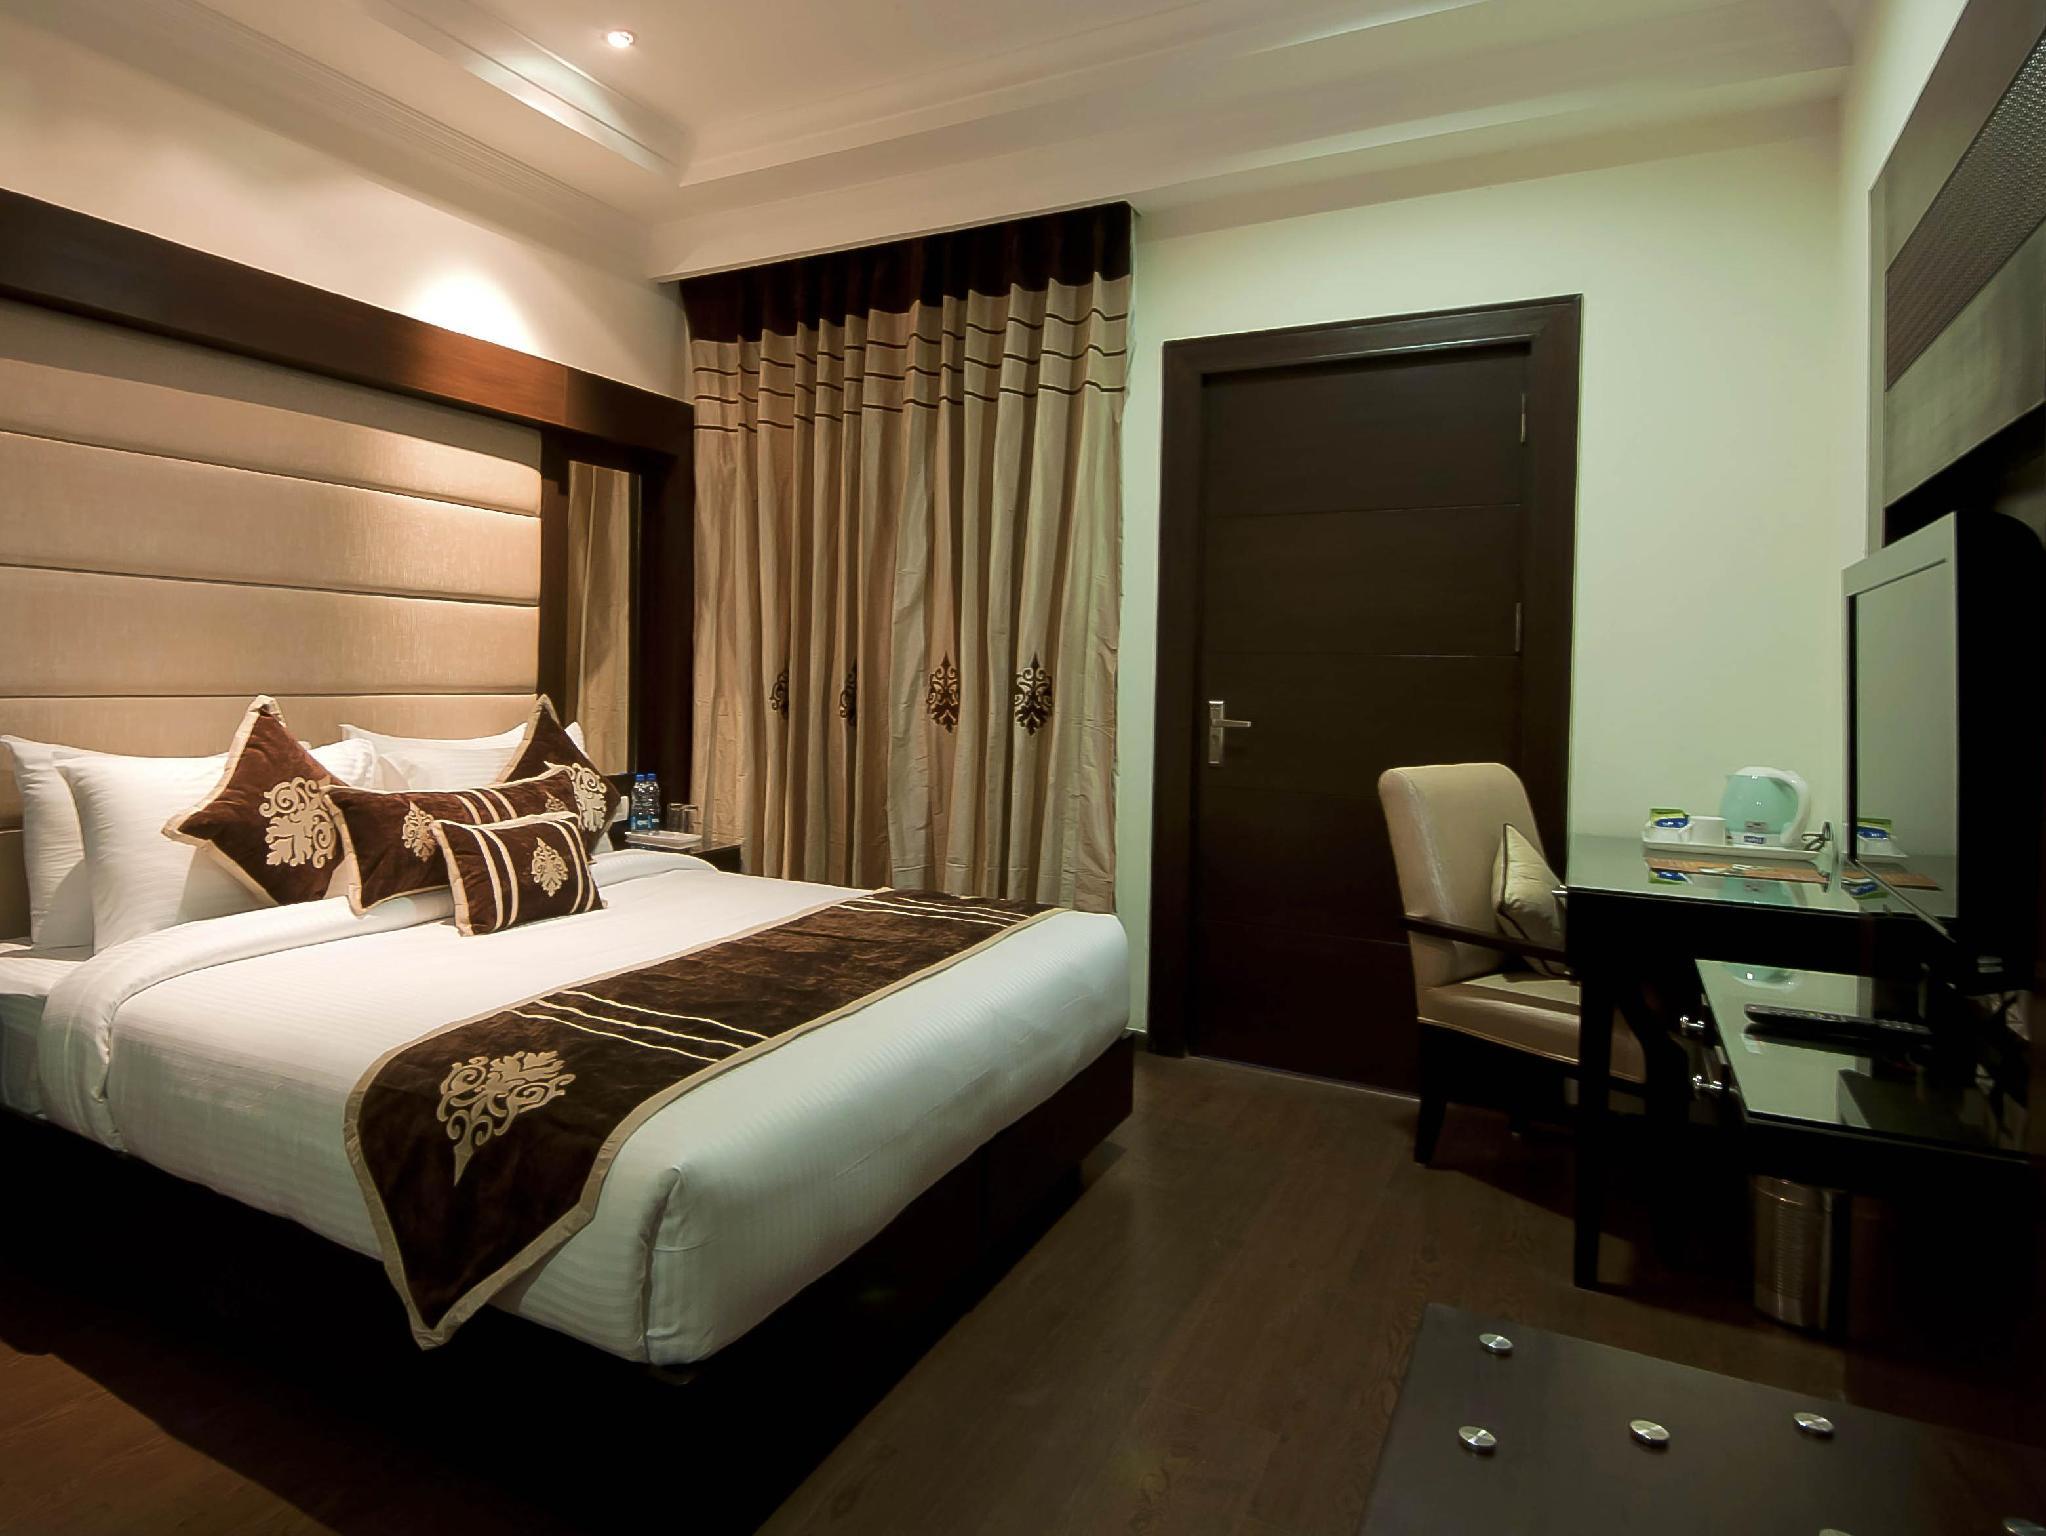 The Hotel Pitrashish Pride